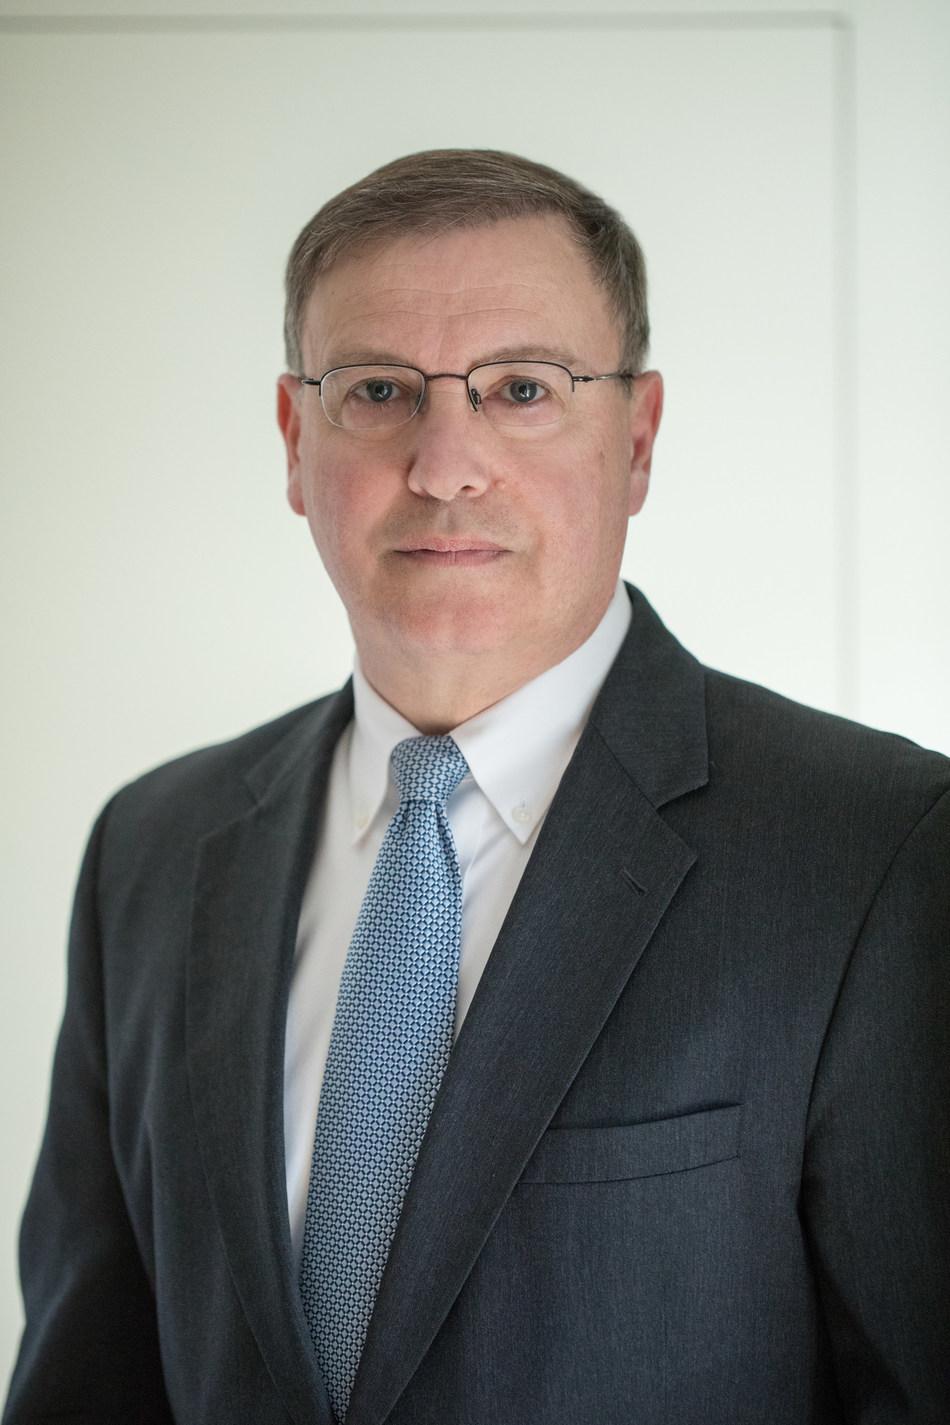 Former Senior Justice Department Official Chuck Rosenberg Joins Crowell & Moring